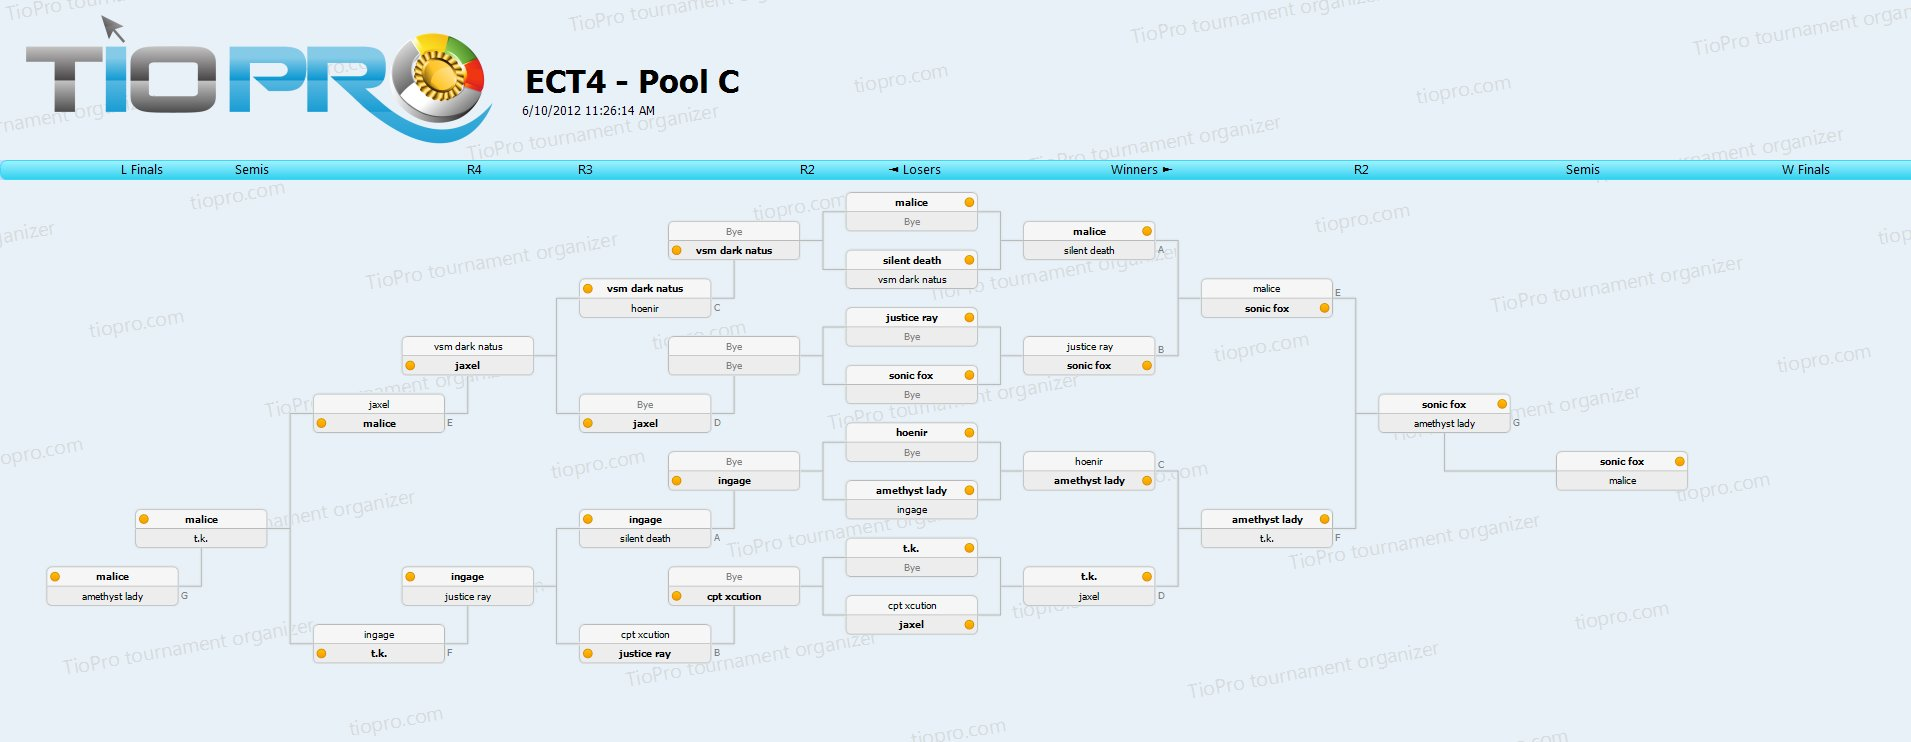 East Coast Throwdown 4 - Pool C